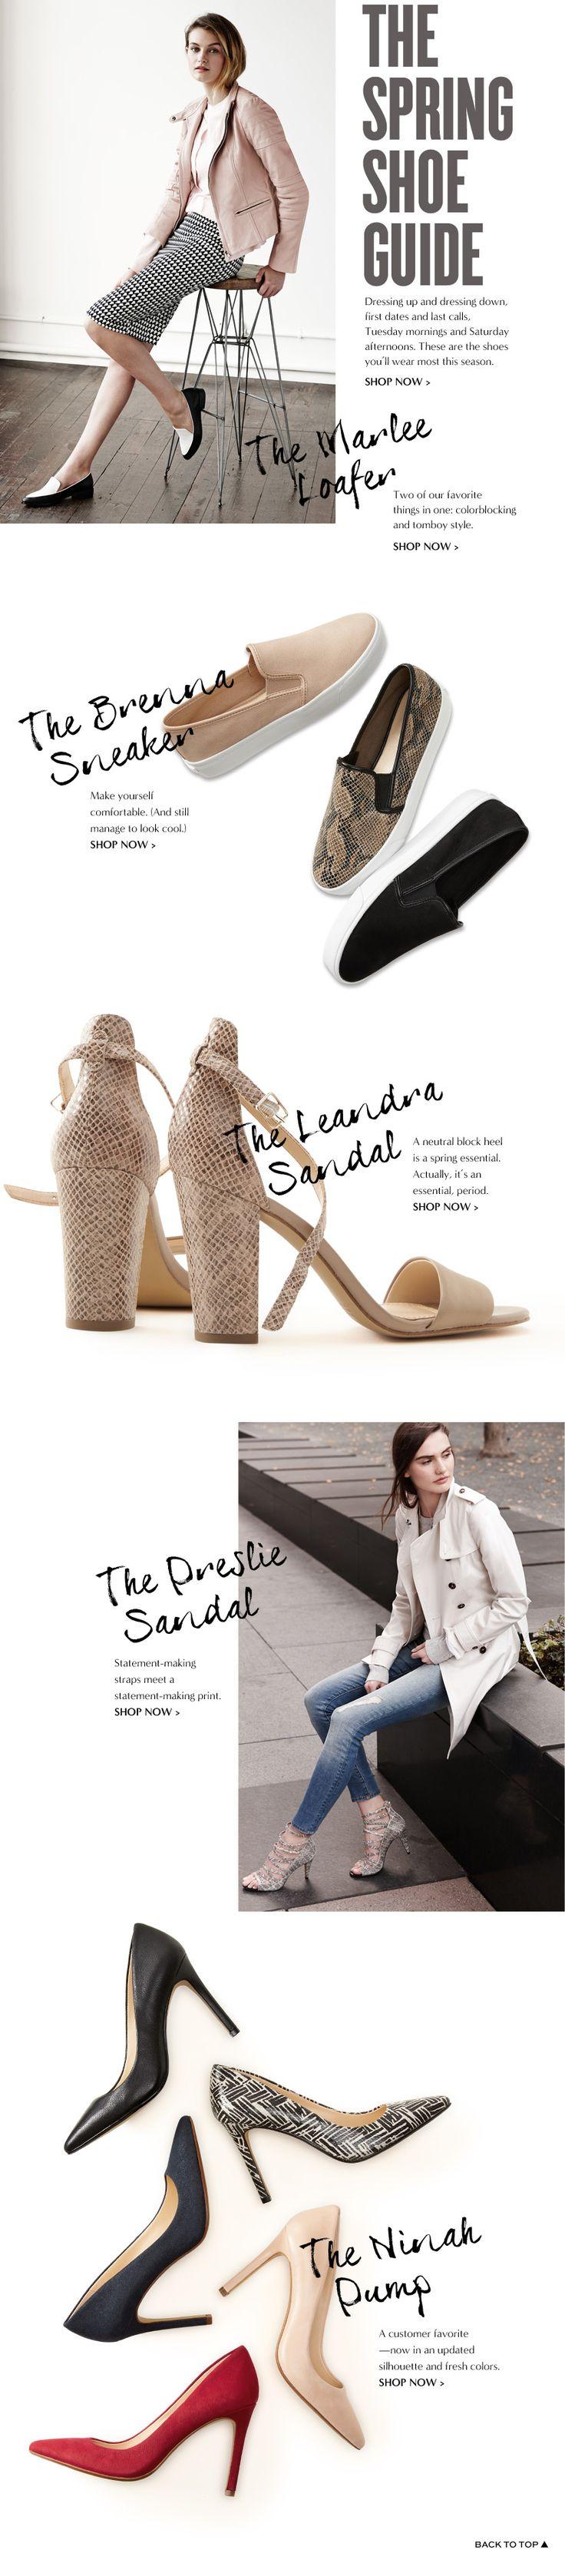 Shoes & Handbags: leather boots, flats, wedges, totes & satchels | Banana Republic